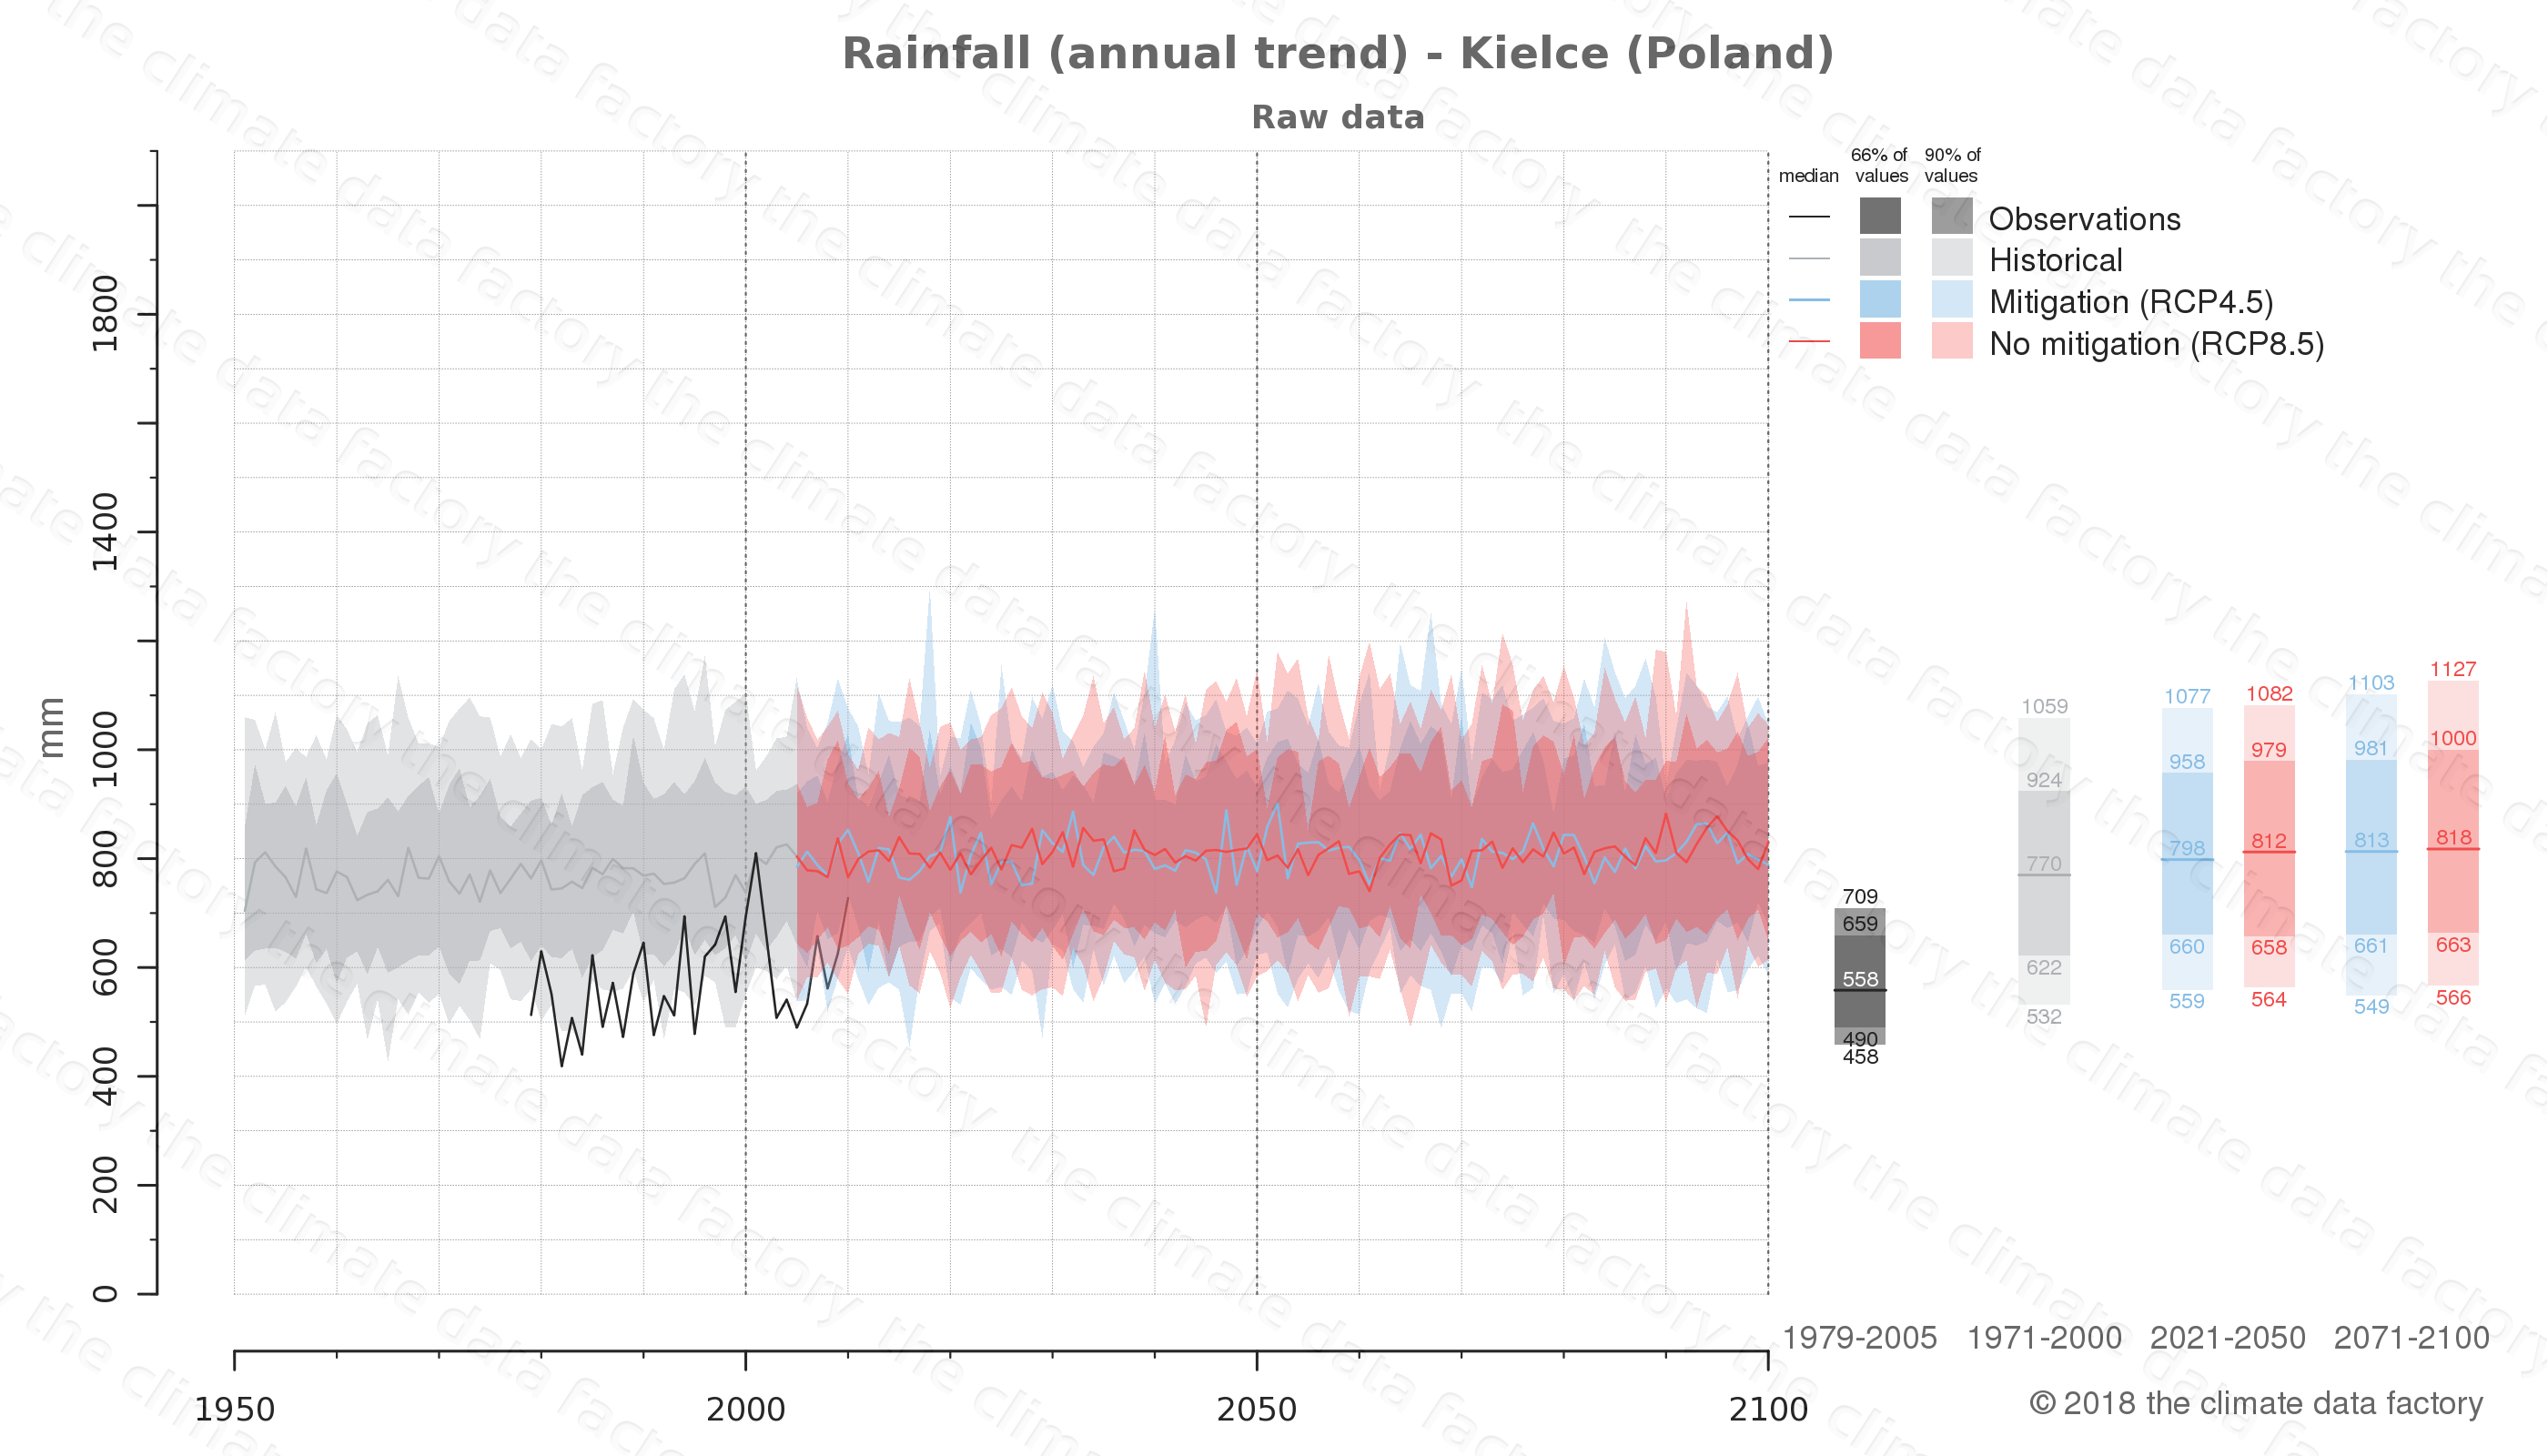 climate change data policy adaptation climate graph city data rainfall kielce poland